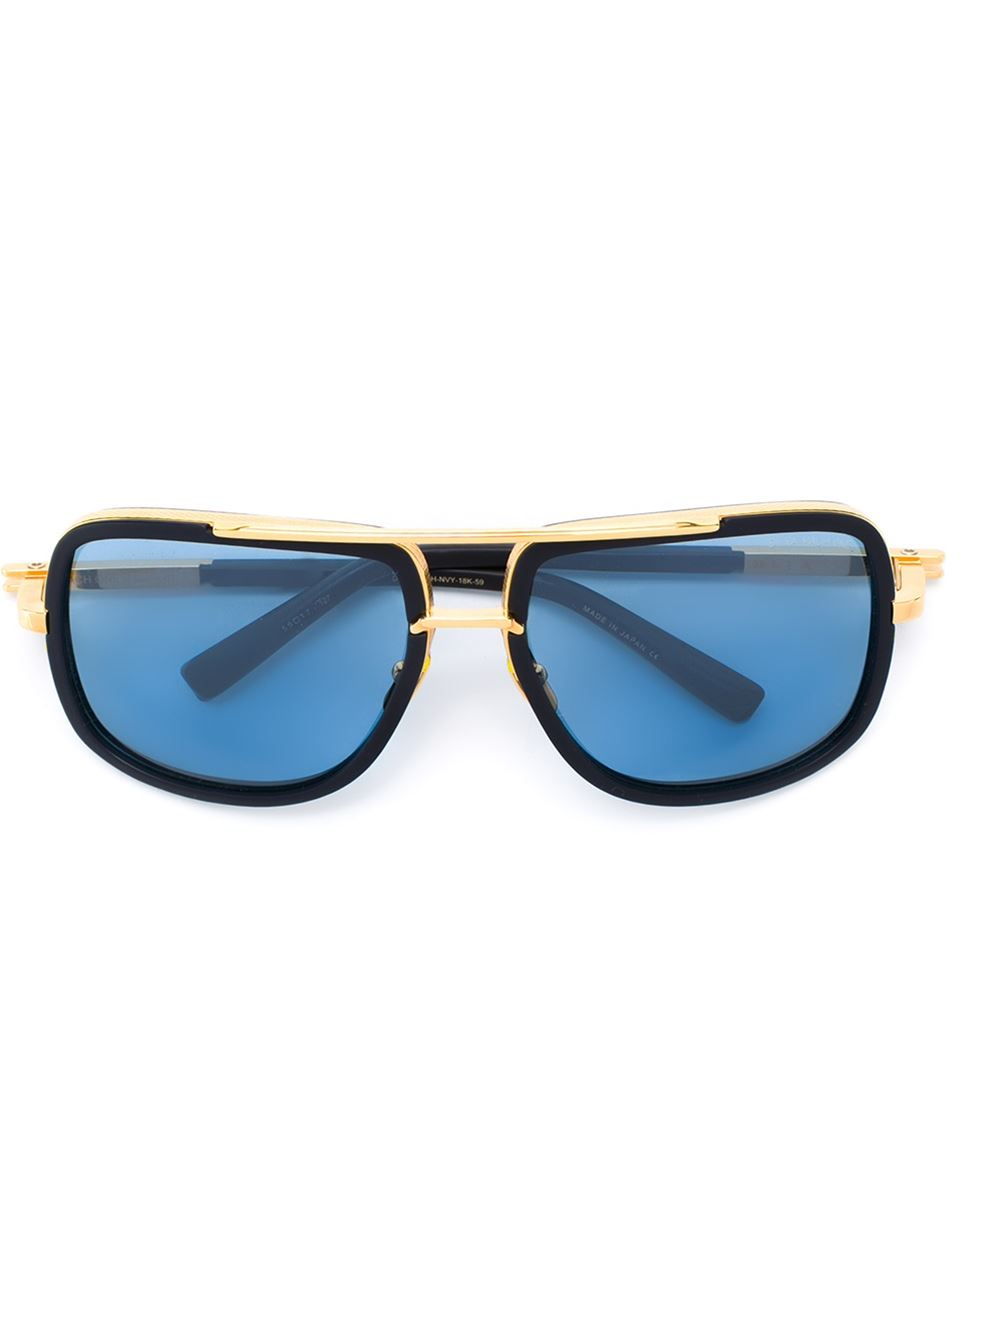 5145064dce20 Dita Mach One Replica Sunglasses - Bitterroot Public Library